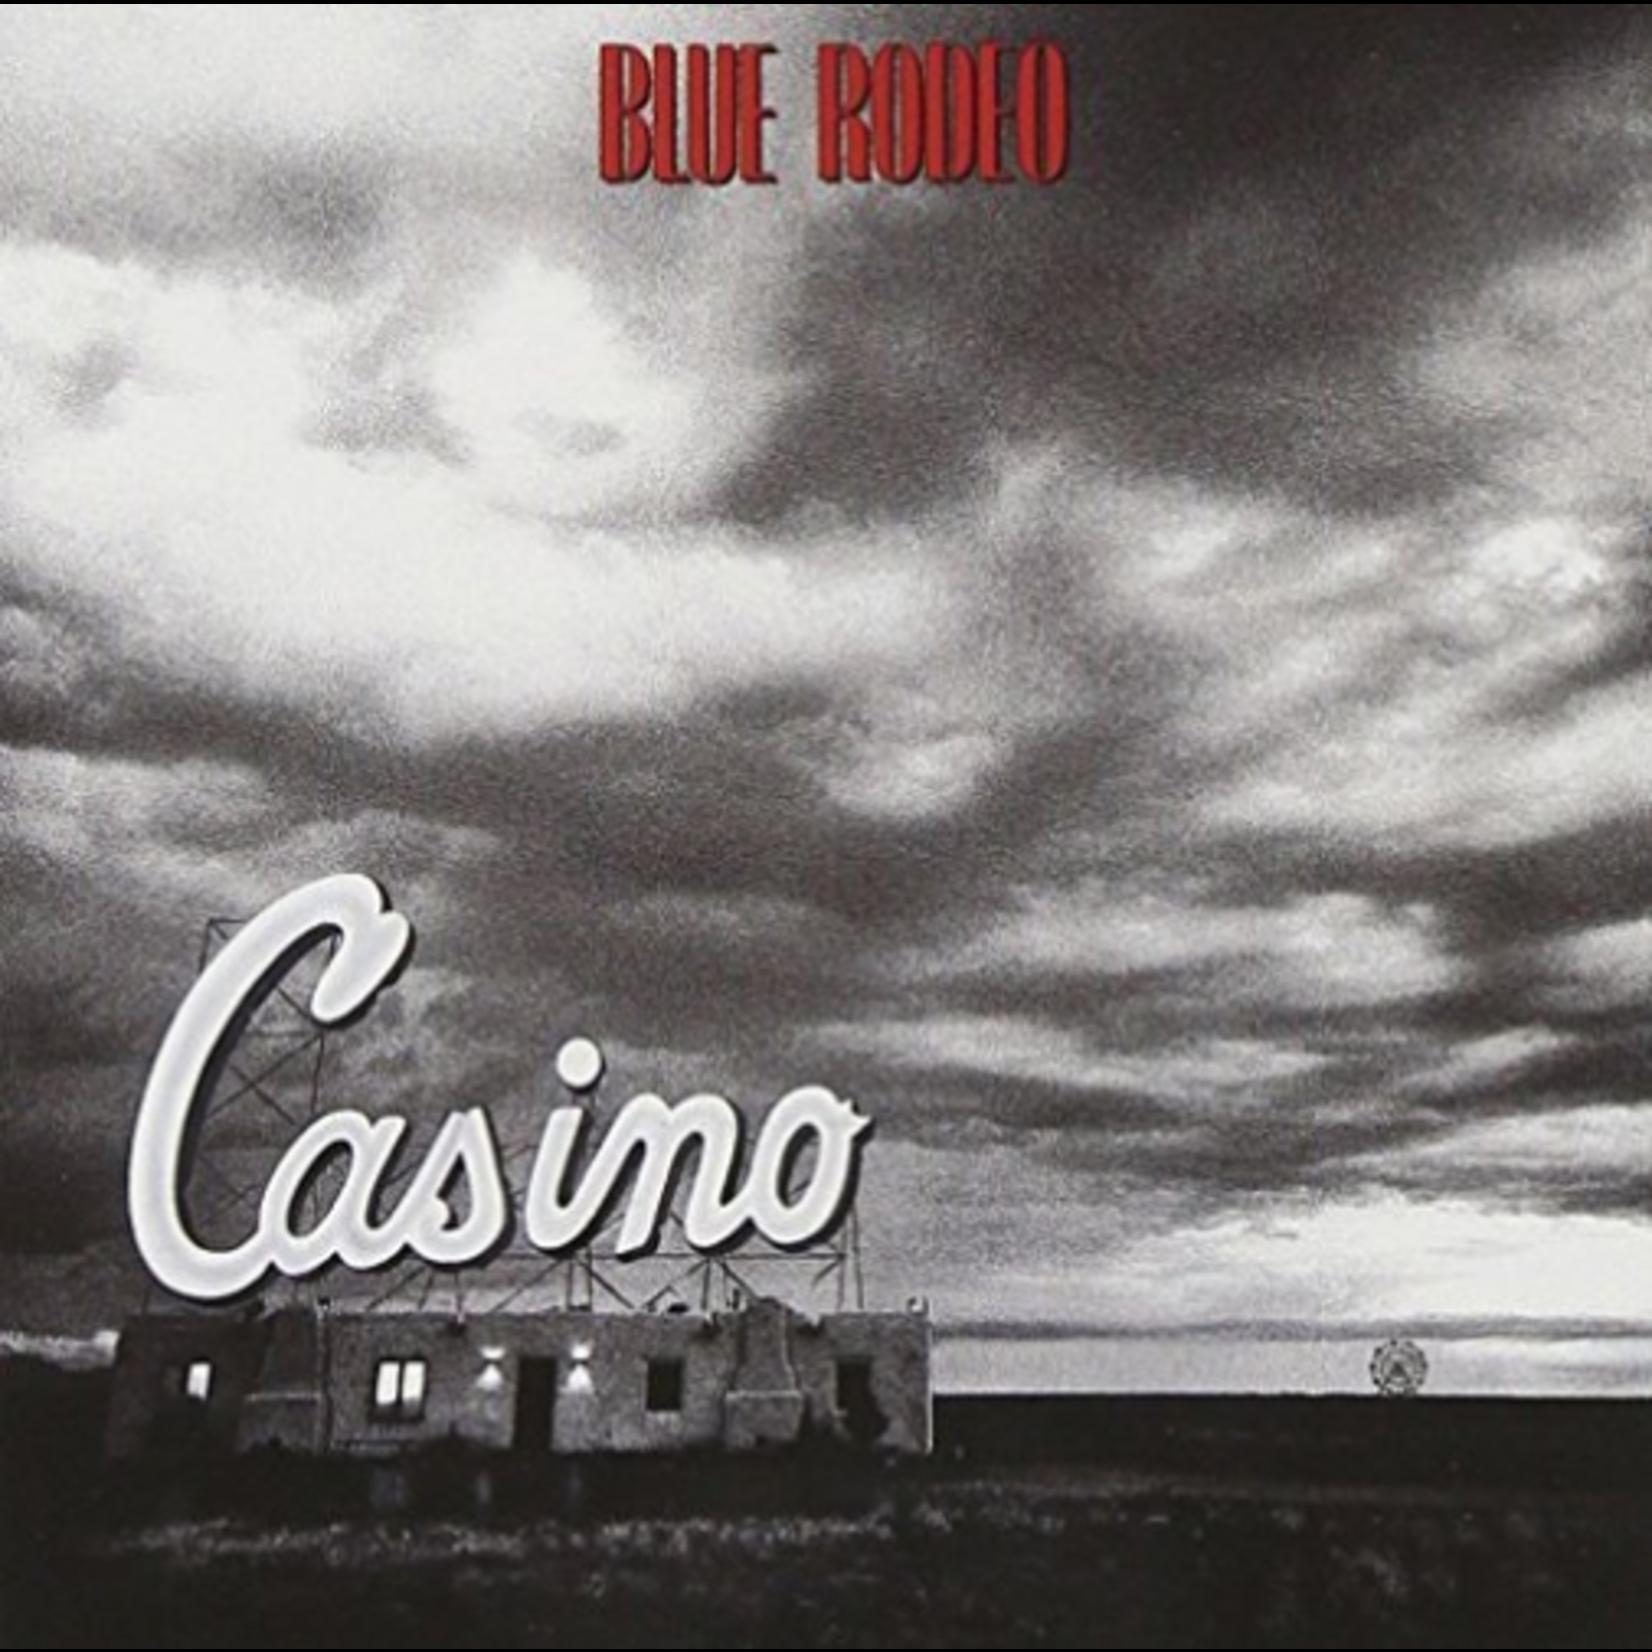 BLUE RODEO CASINO (LP)